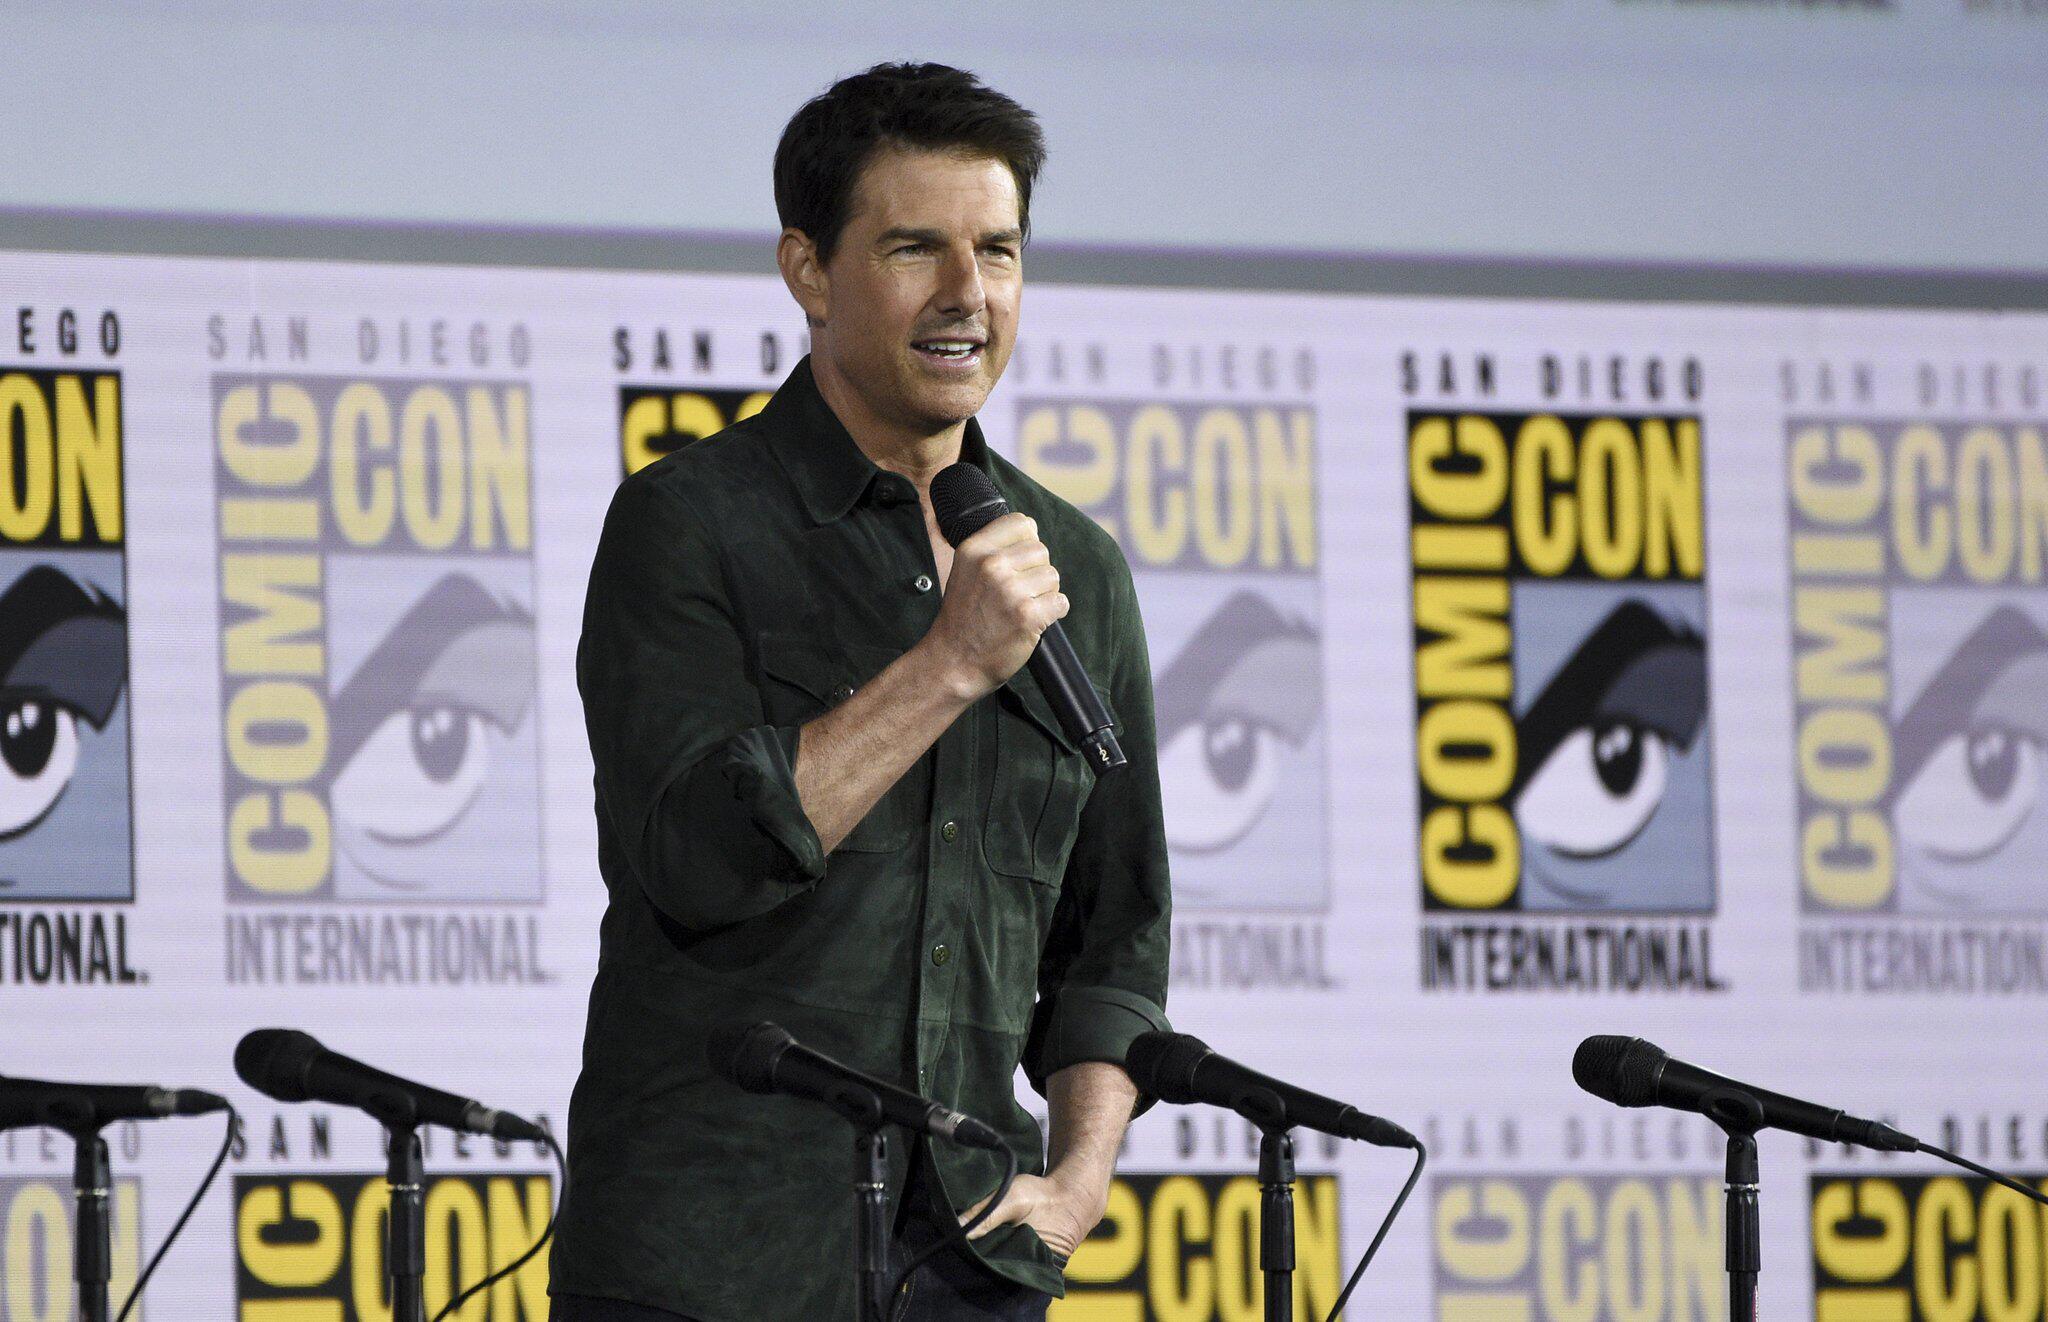 Bild zu Tom Cruise auf Comic-Con-Messe